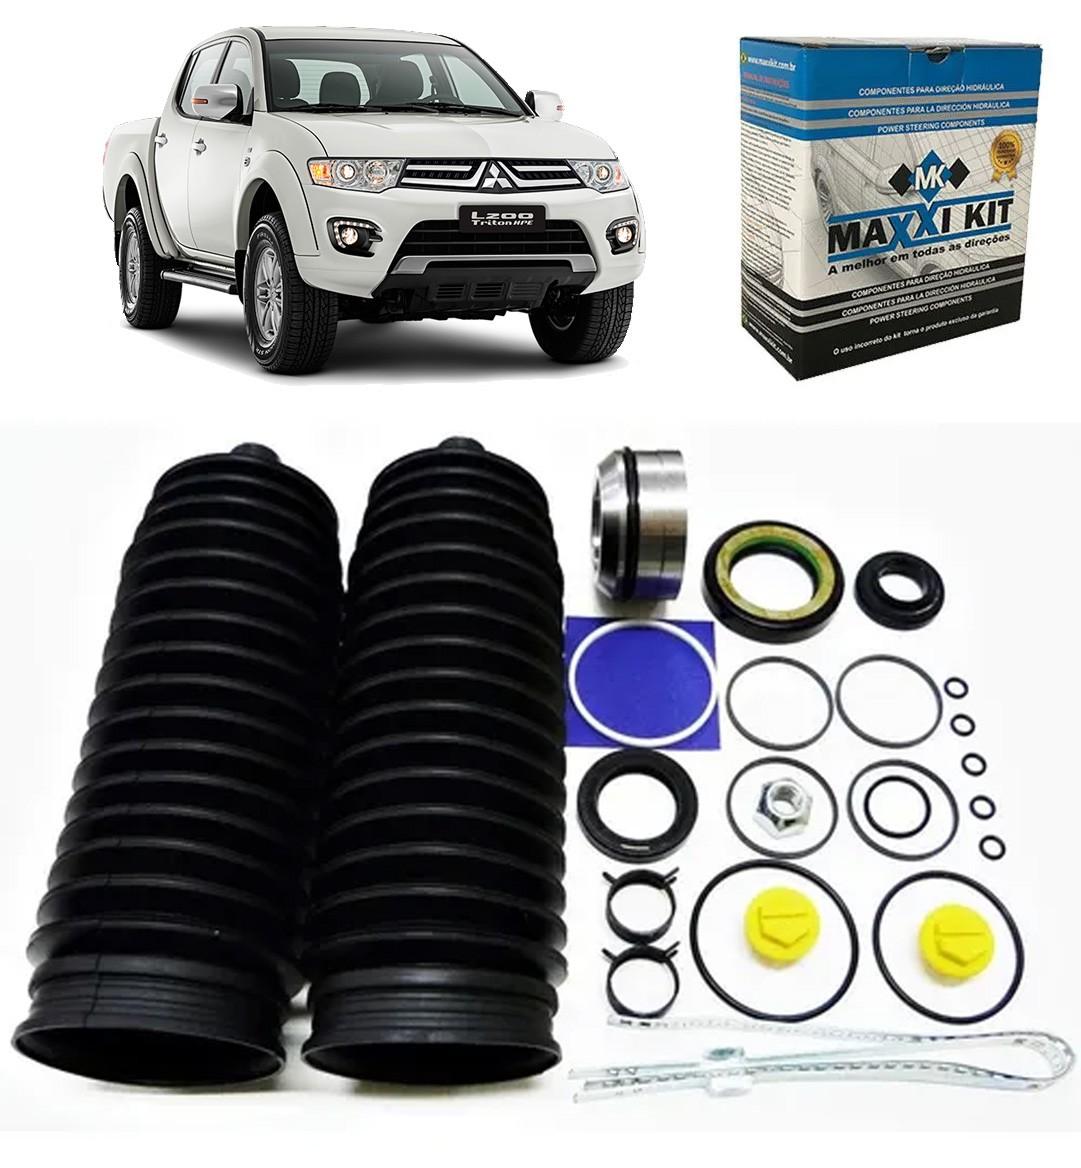 Reparo Caixa De Direção Hidráulica L200 Triton | Pajero Dakar | Savana